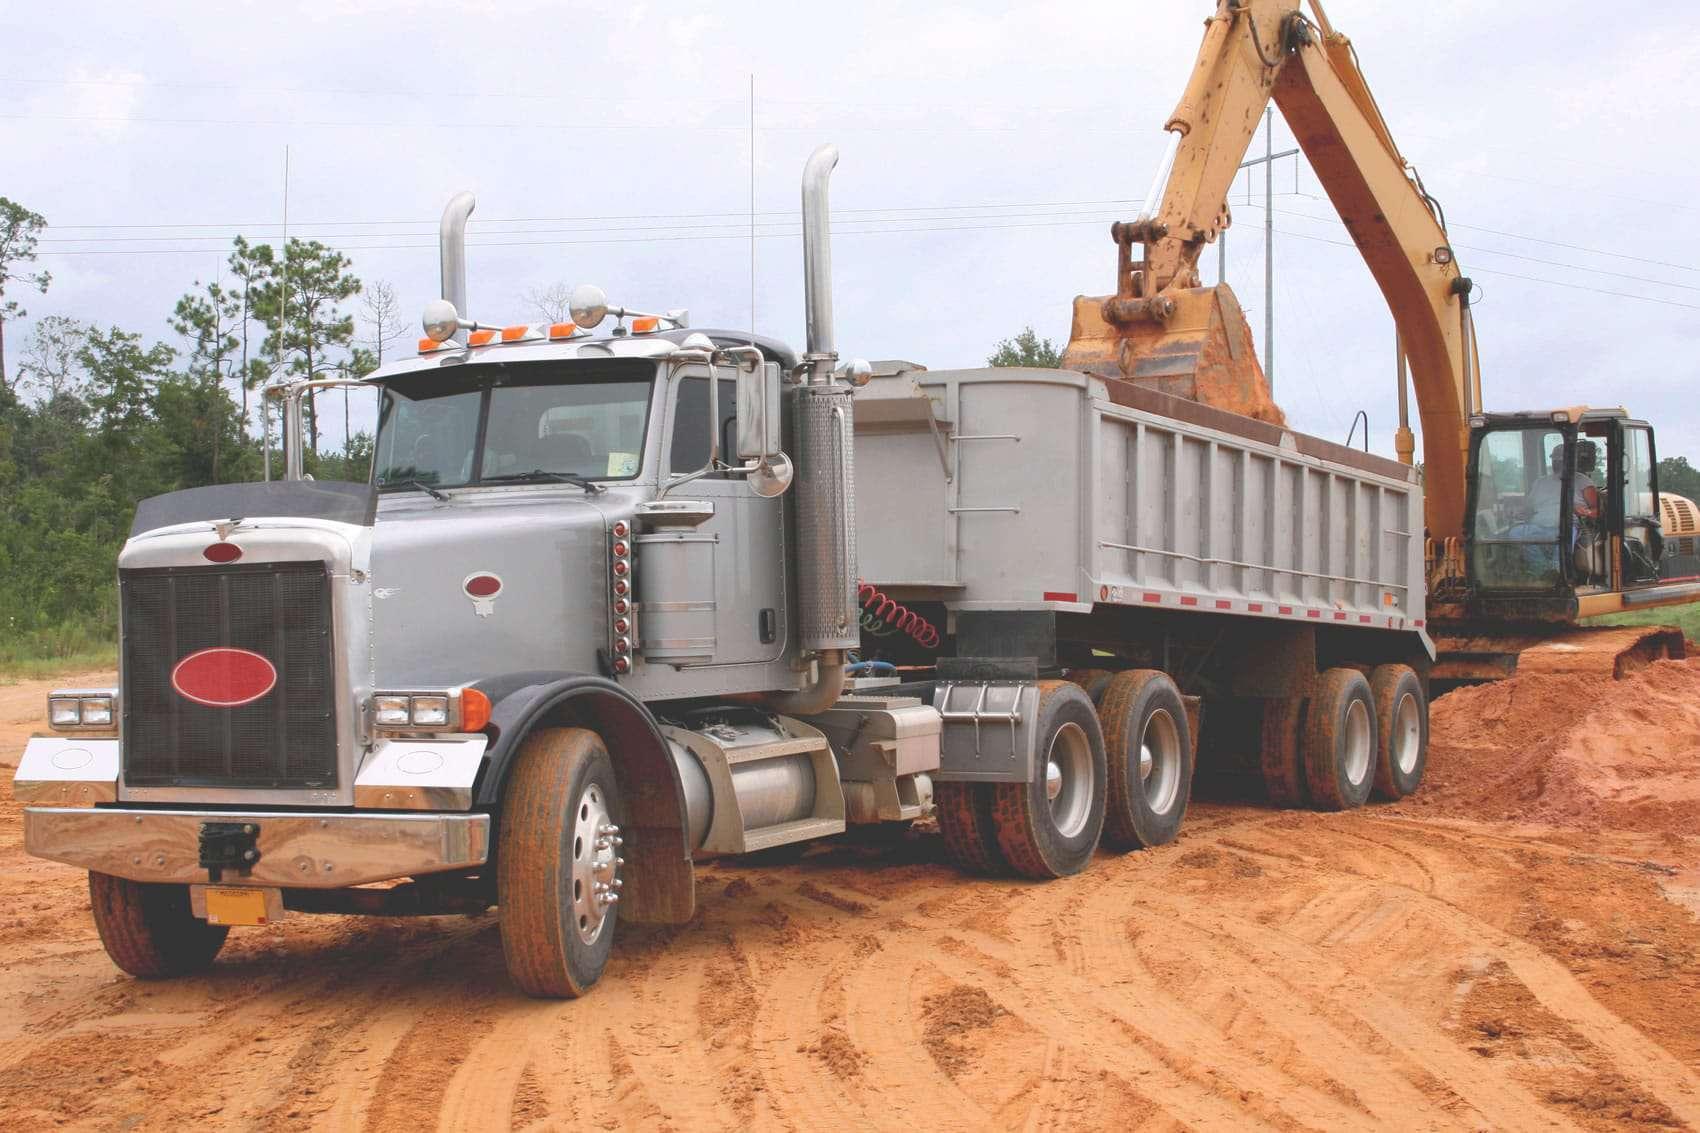 Dump Truck Construction Haul Off for Sand, Dirt